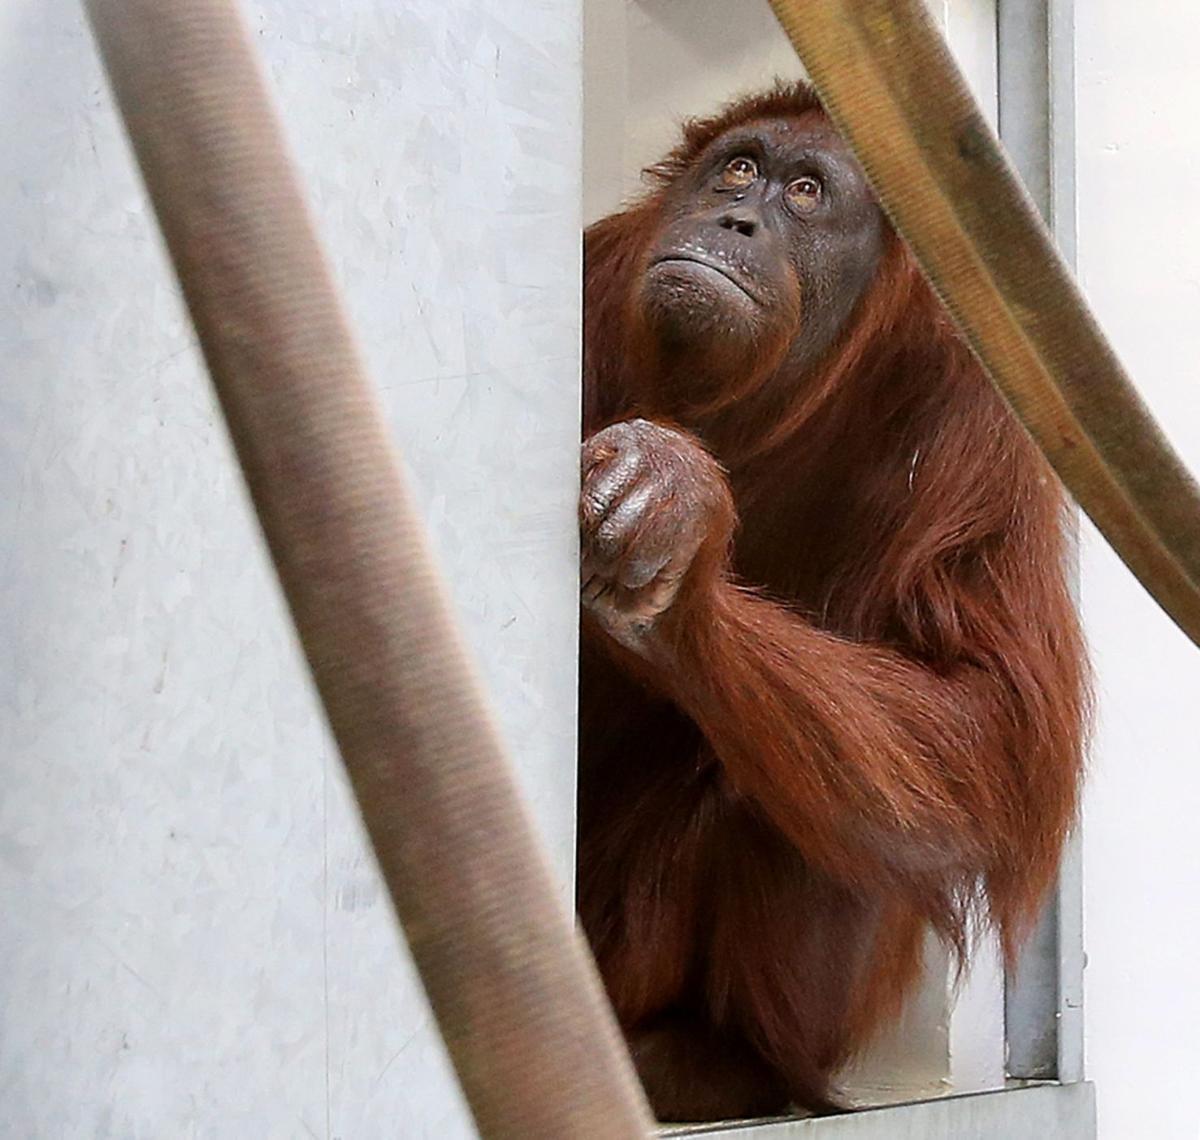 Cameron Park Zoo welcomes new companion for orangutan raised